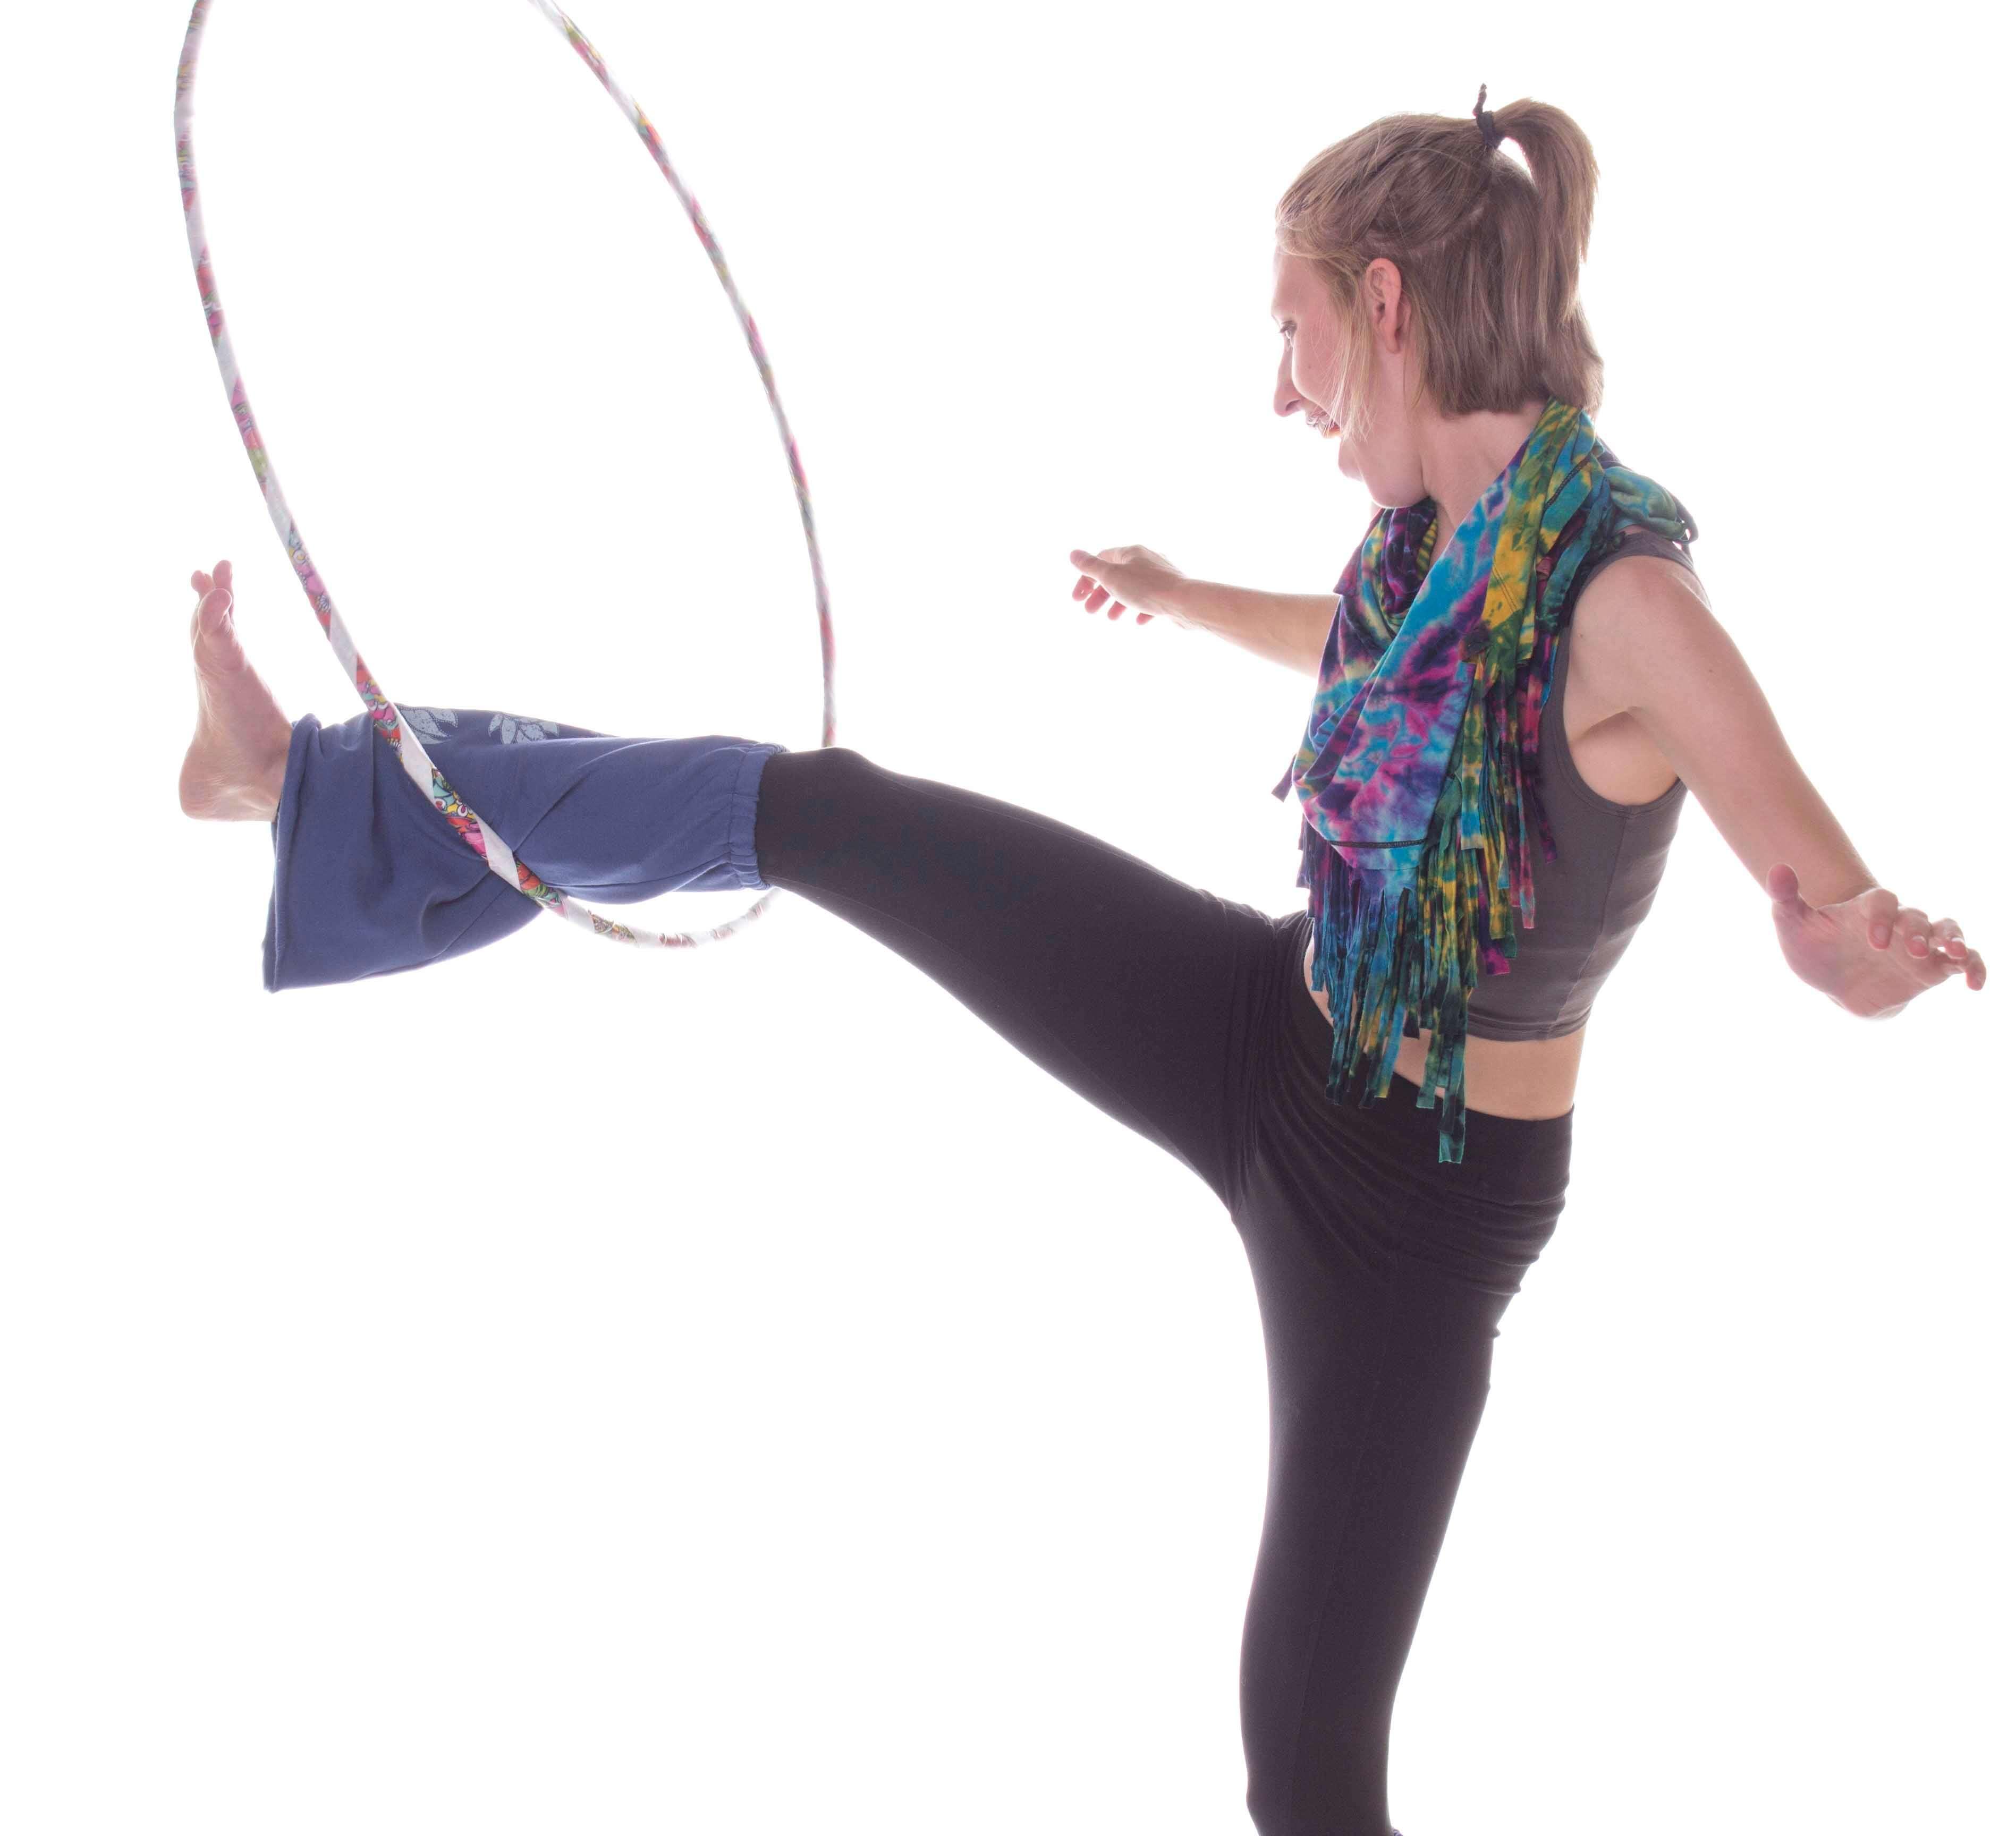 IMG 8639 - How to Make a Hula Hoop - DIY Hula Hoop